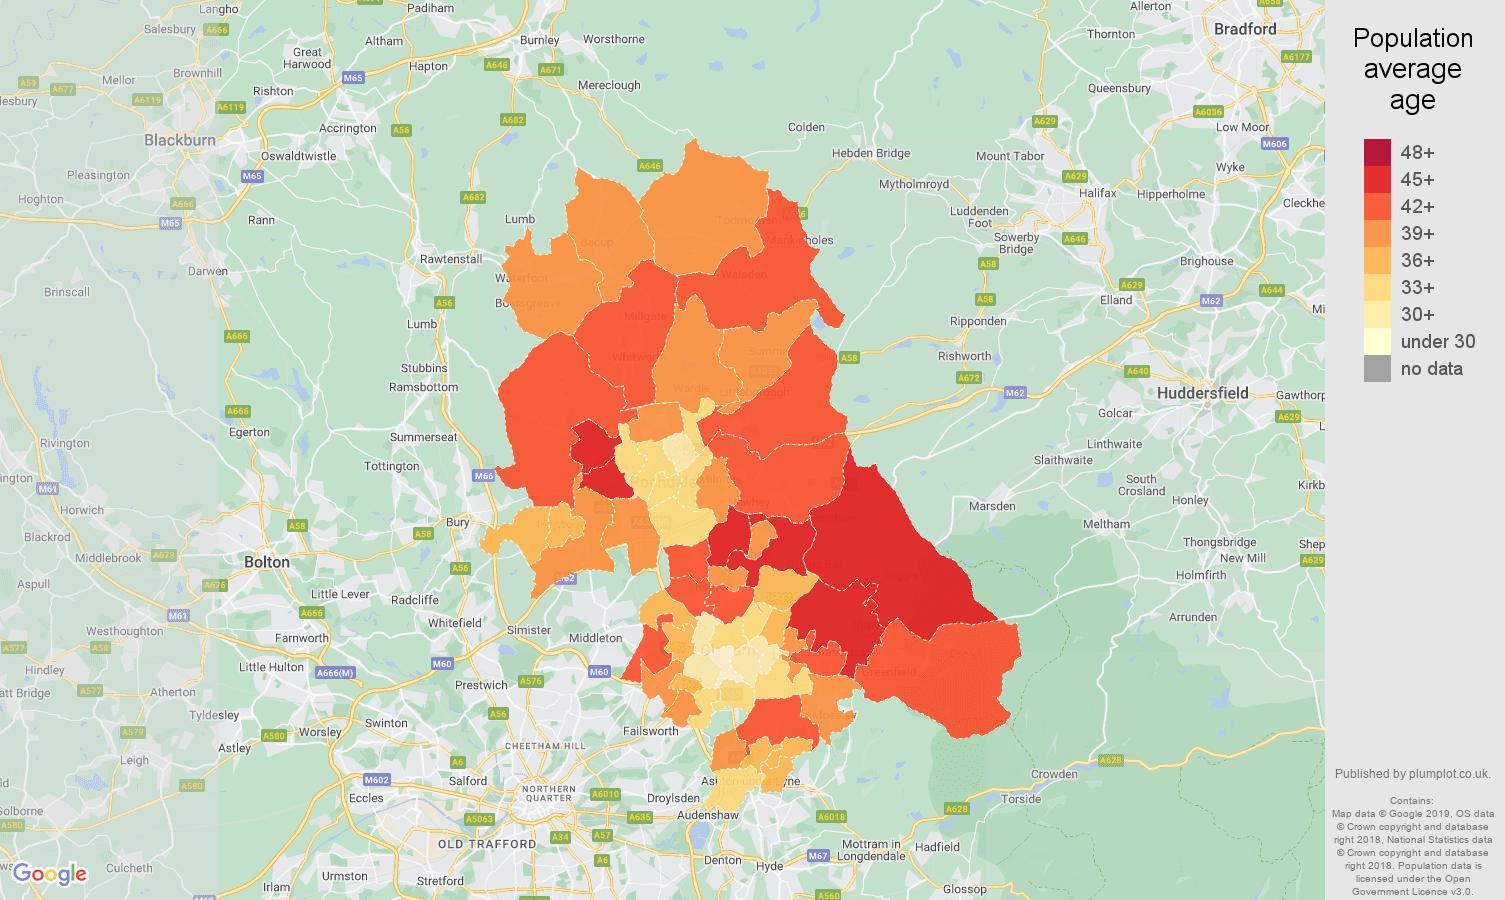 Oldham population average age map